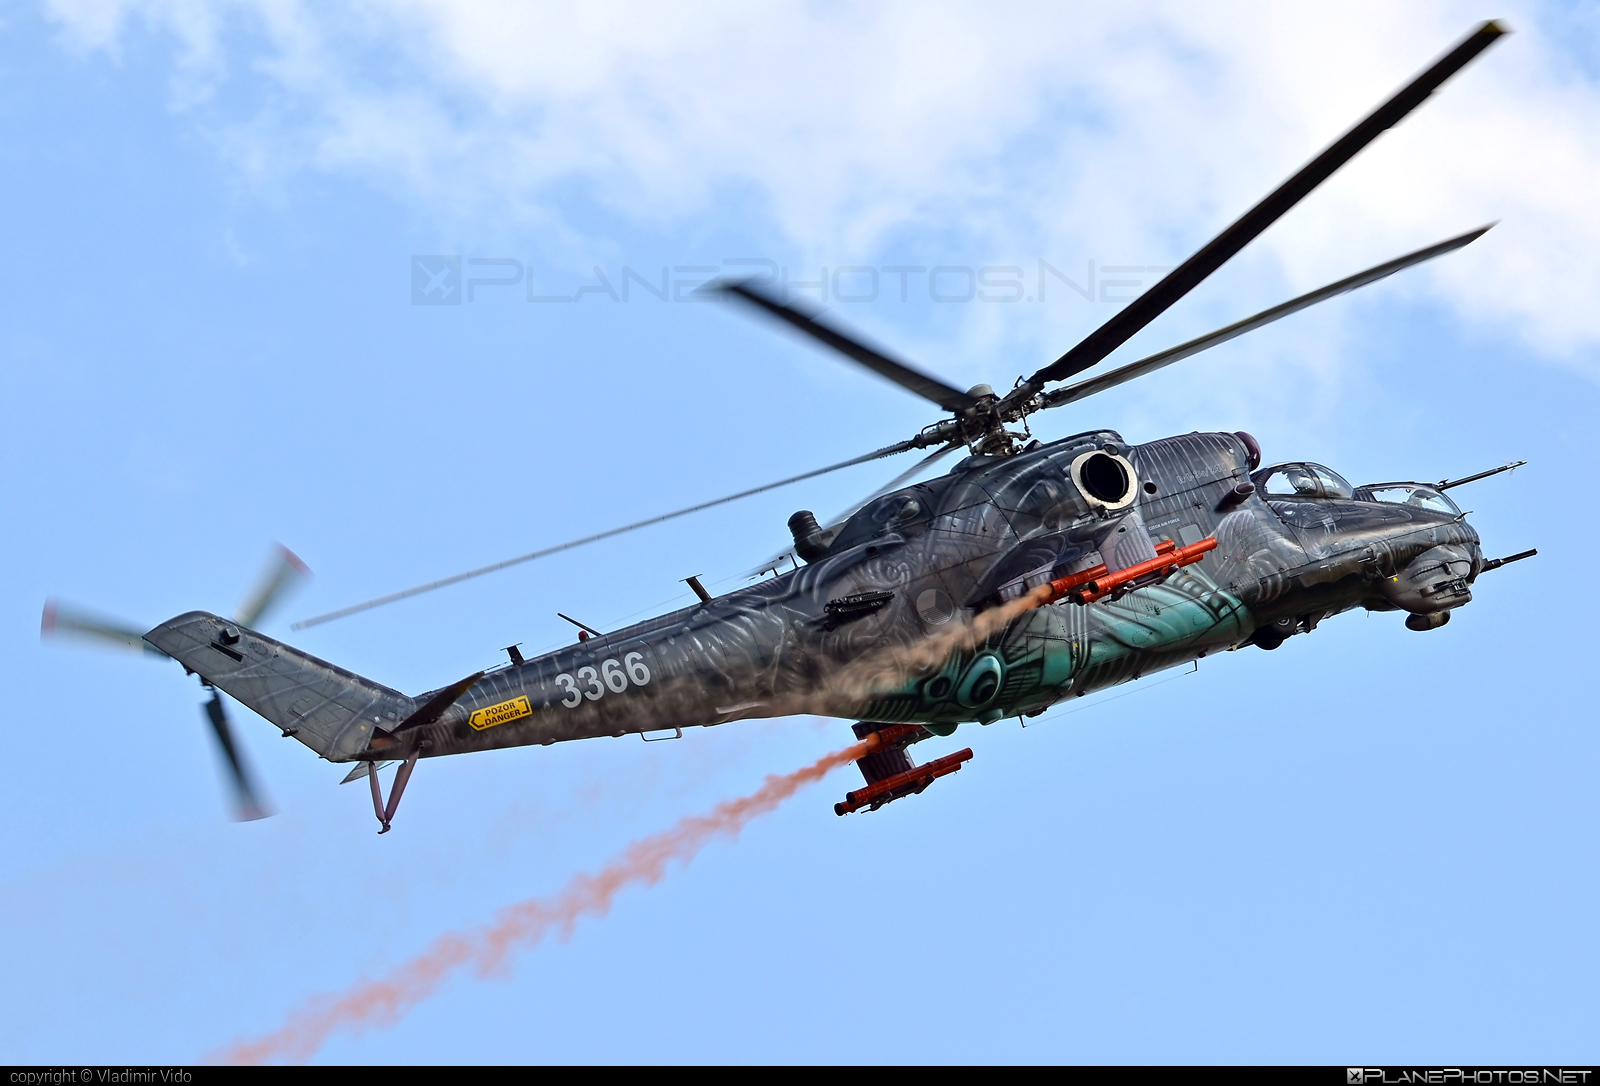 Mil Mi-35 - 3366 operated by Vzdušné síly AČR (Czech Air Force) #czechairforce #mi35 #mil #milhelicopters #siad2017 #vzdusnesilyacr